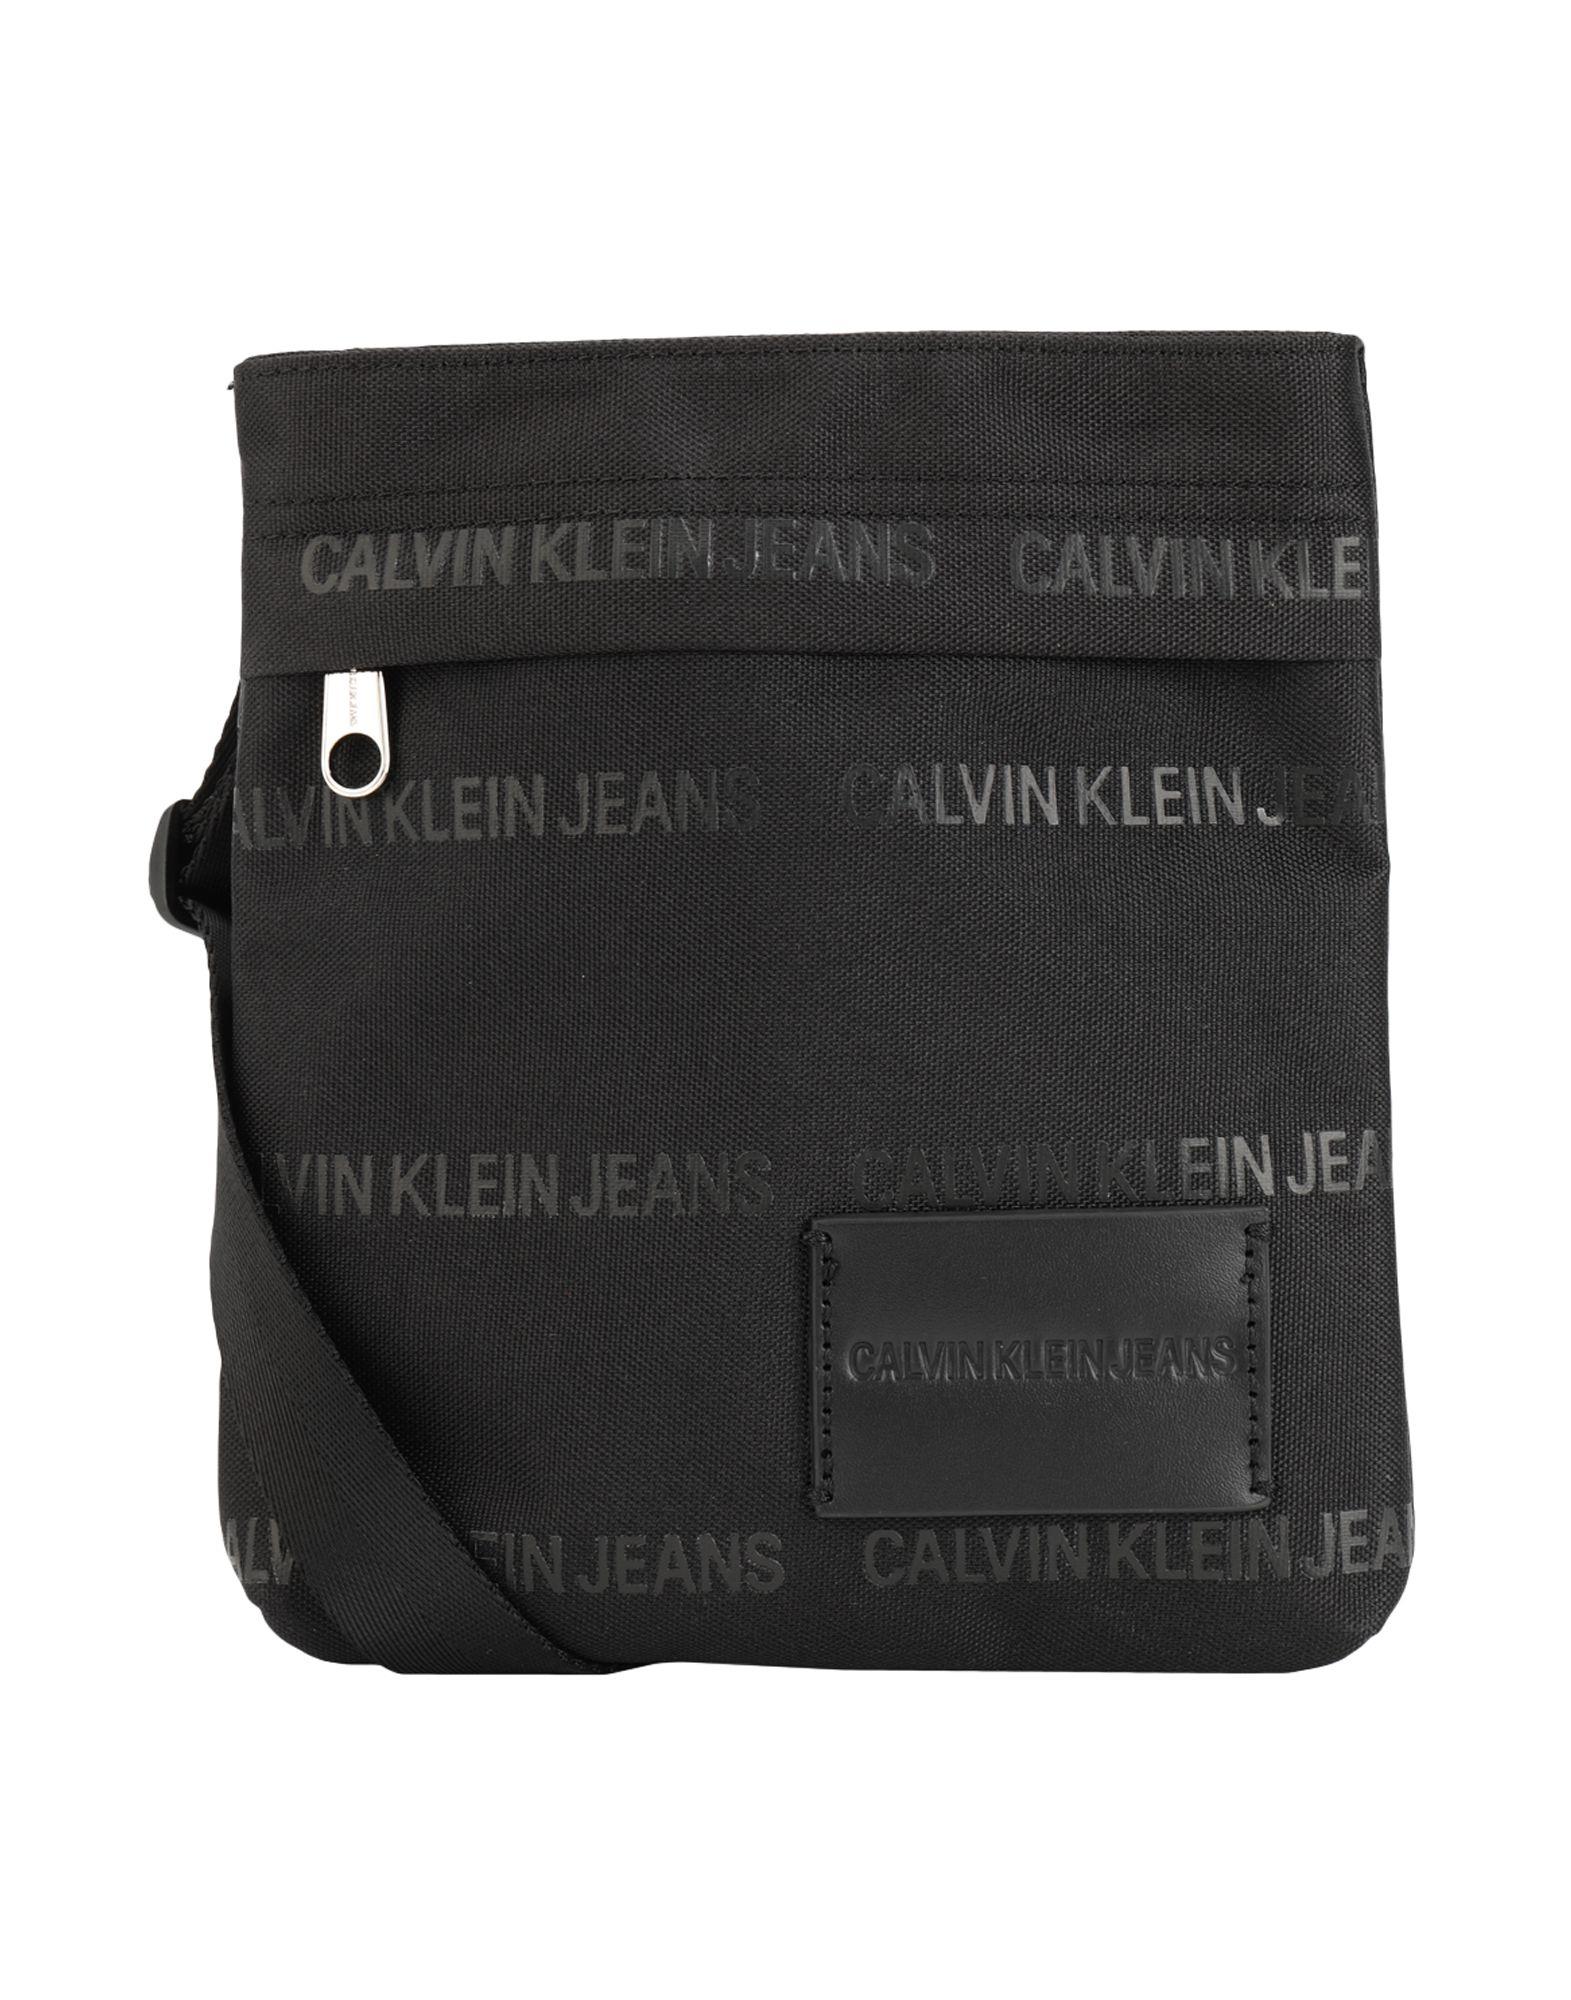 CALVIN KLEIN JEANS Сумка через плечо calvin klein jeans сумка через плечо